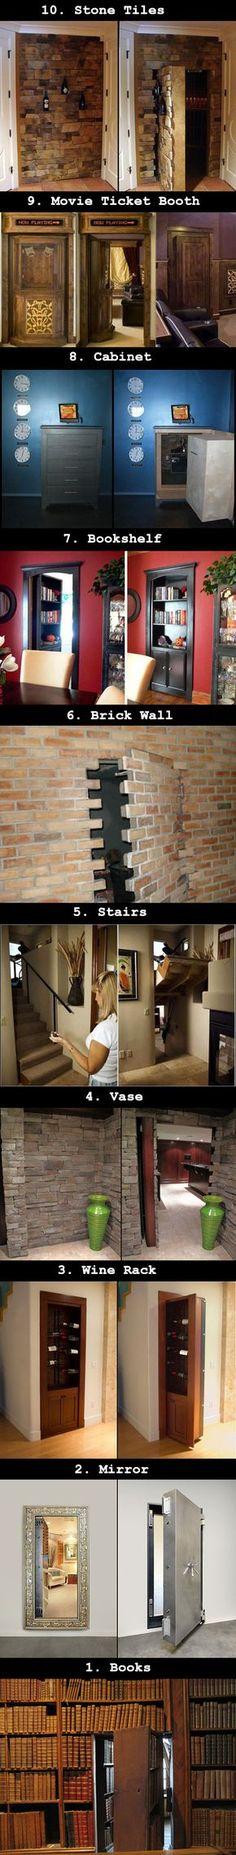 Secret Hidden Passageways In House House Fat And Room